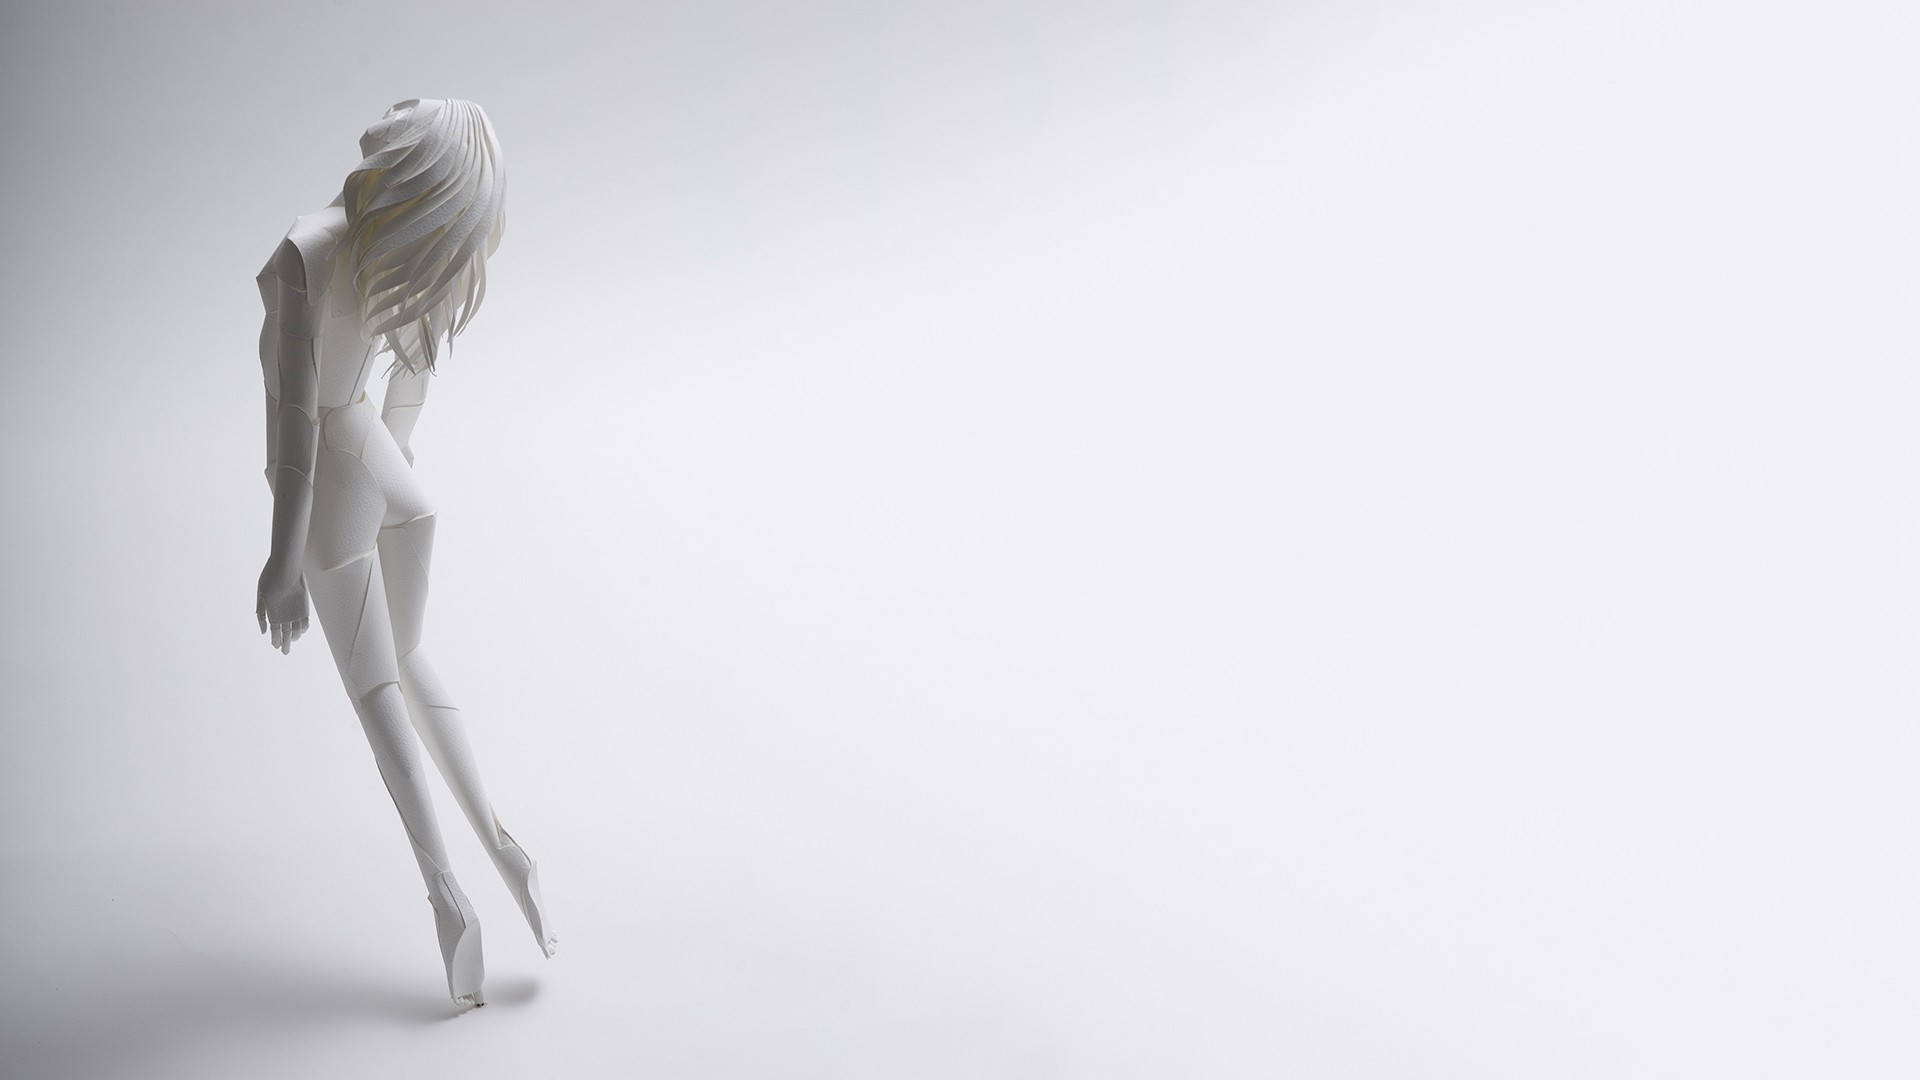 White Minimalist Desktop Wallpaper